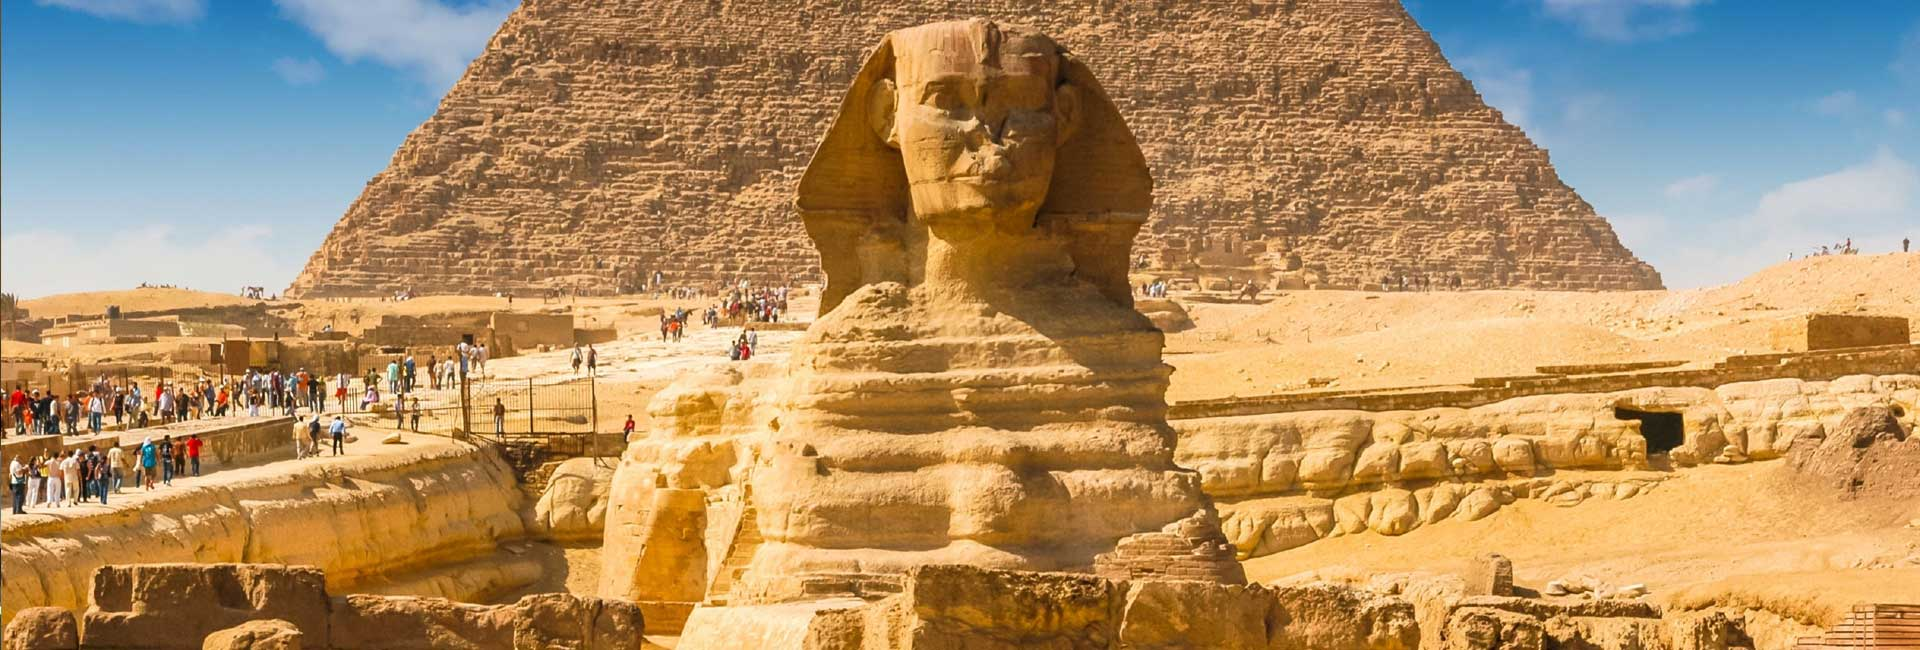 Cairo Top Attractions